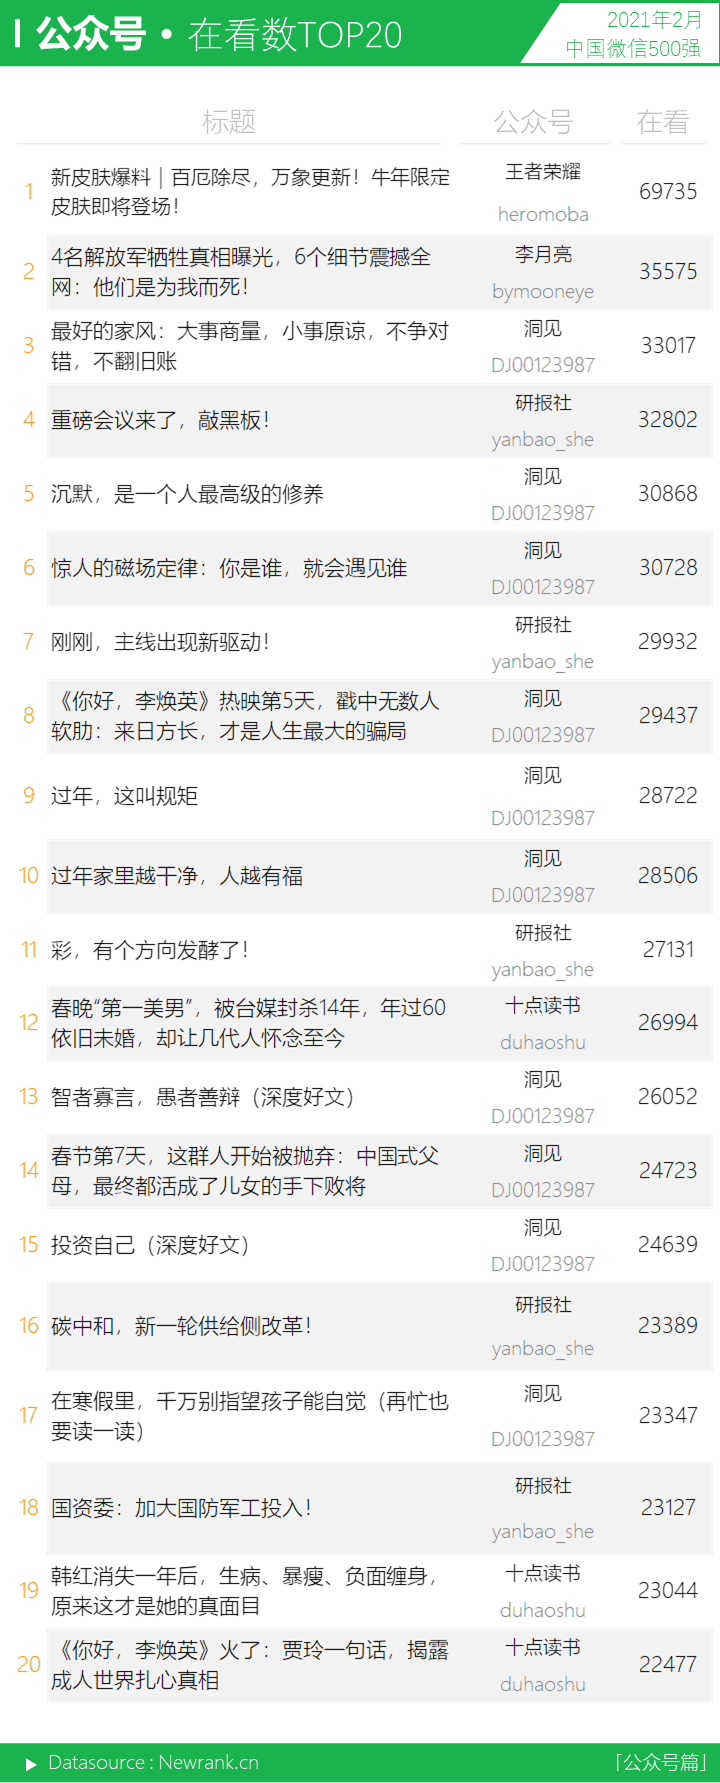 <a href='https://www.zhouxiaohui.cn'><a href='https://www.zhouxiaohui.cn/duanshipin/'>视频号</a></a>获赞数暴涨!微信生态又有哪些变化? | 中国微信500强月报-第15张图片-周小辉博客